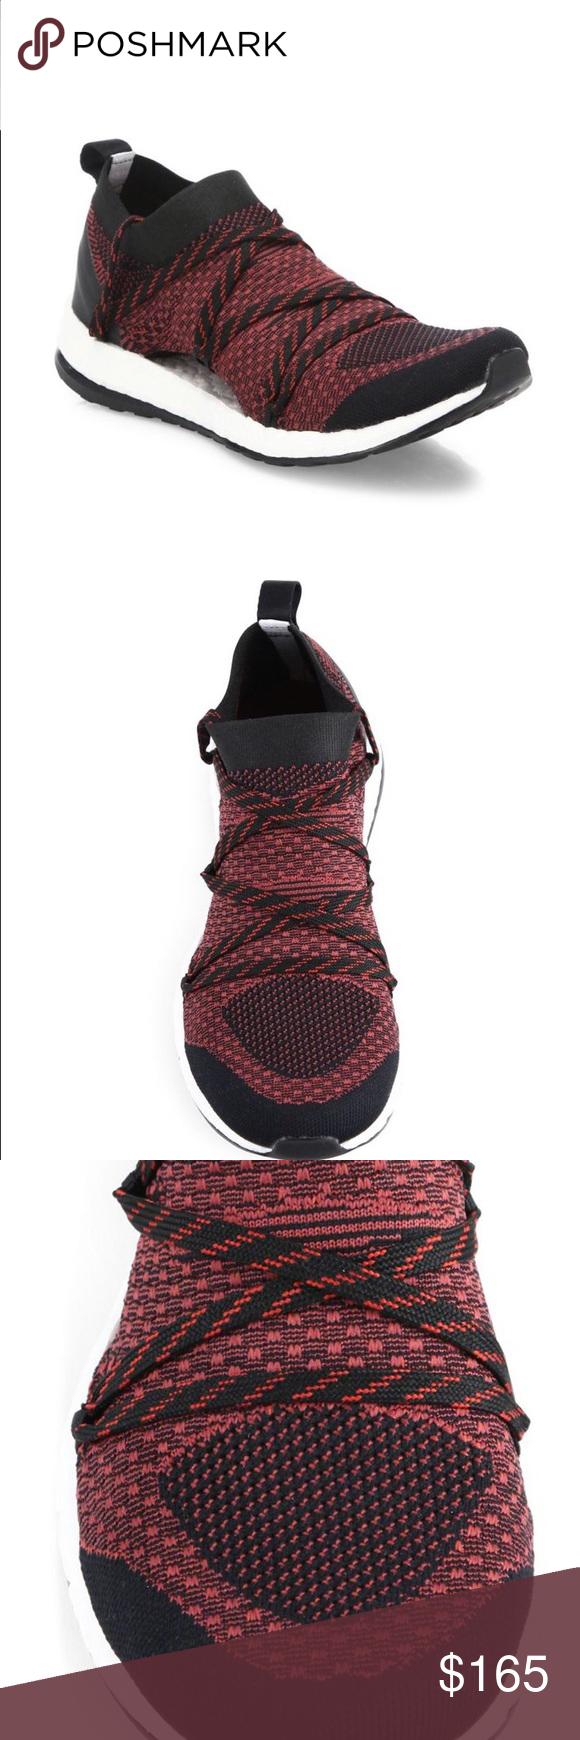 b7b37ca8ebc0e Adidas by Stella McCartney running sneakers Brand new Adidas by Stella  McCartney pure boost X running